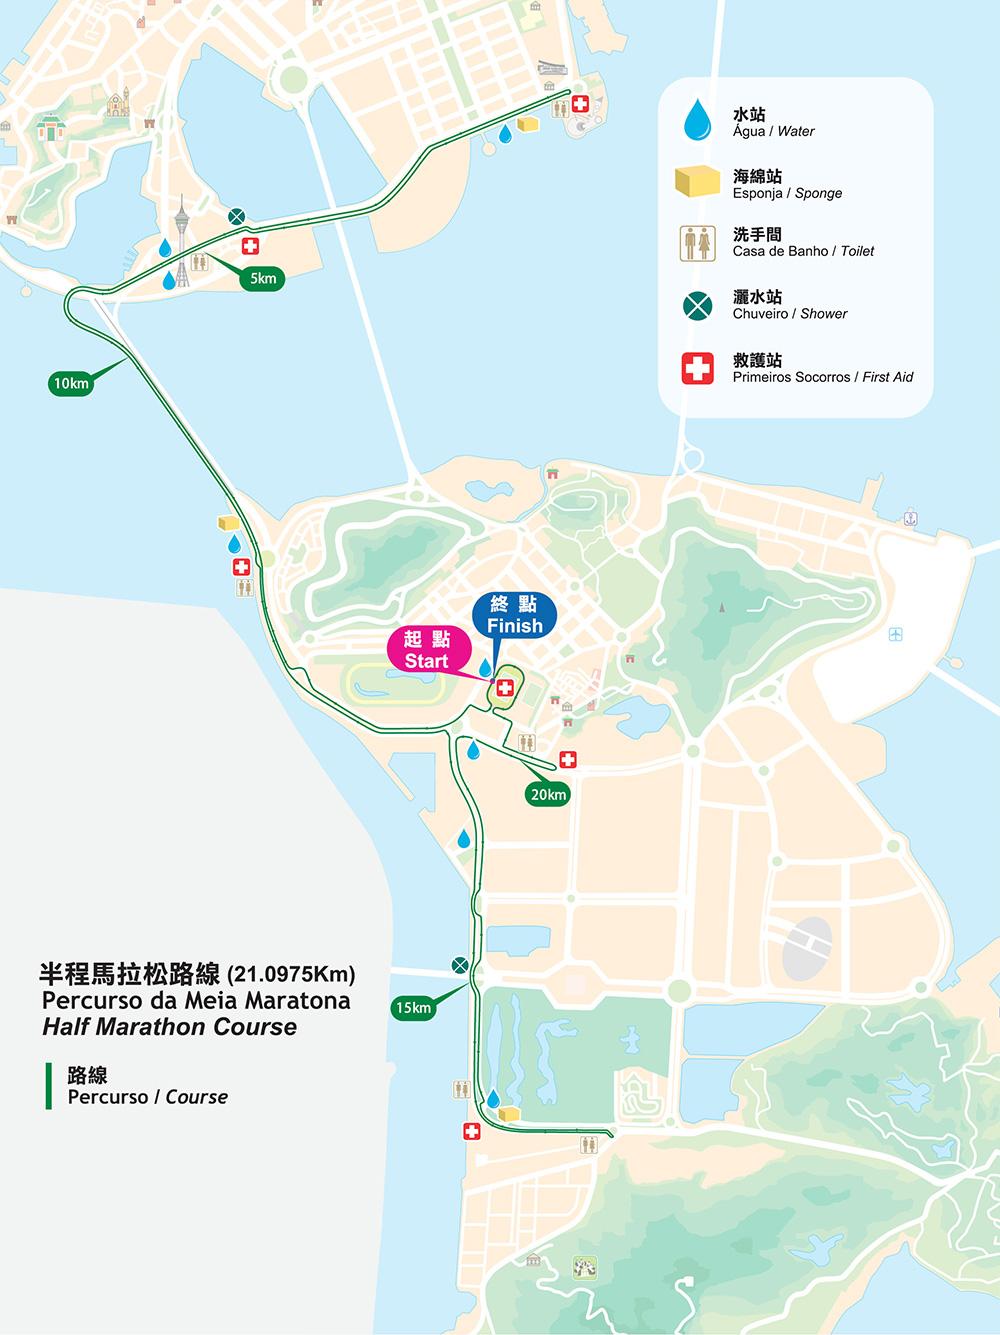 Macau Half Marathon Course BE  IRONMAN  CHICAGO Marathon - Chicago marathon map 2016